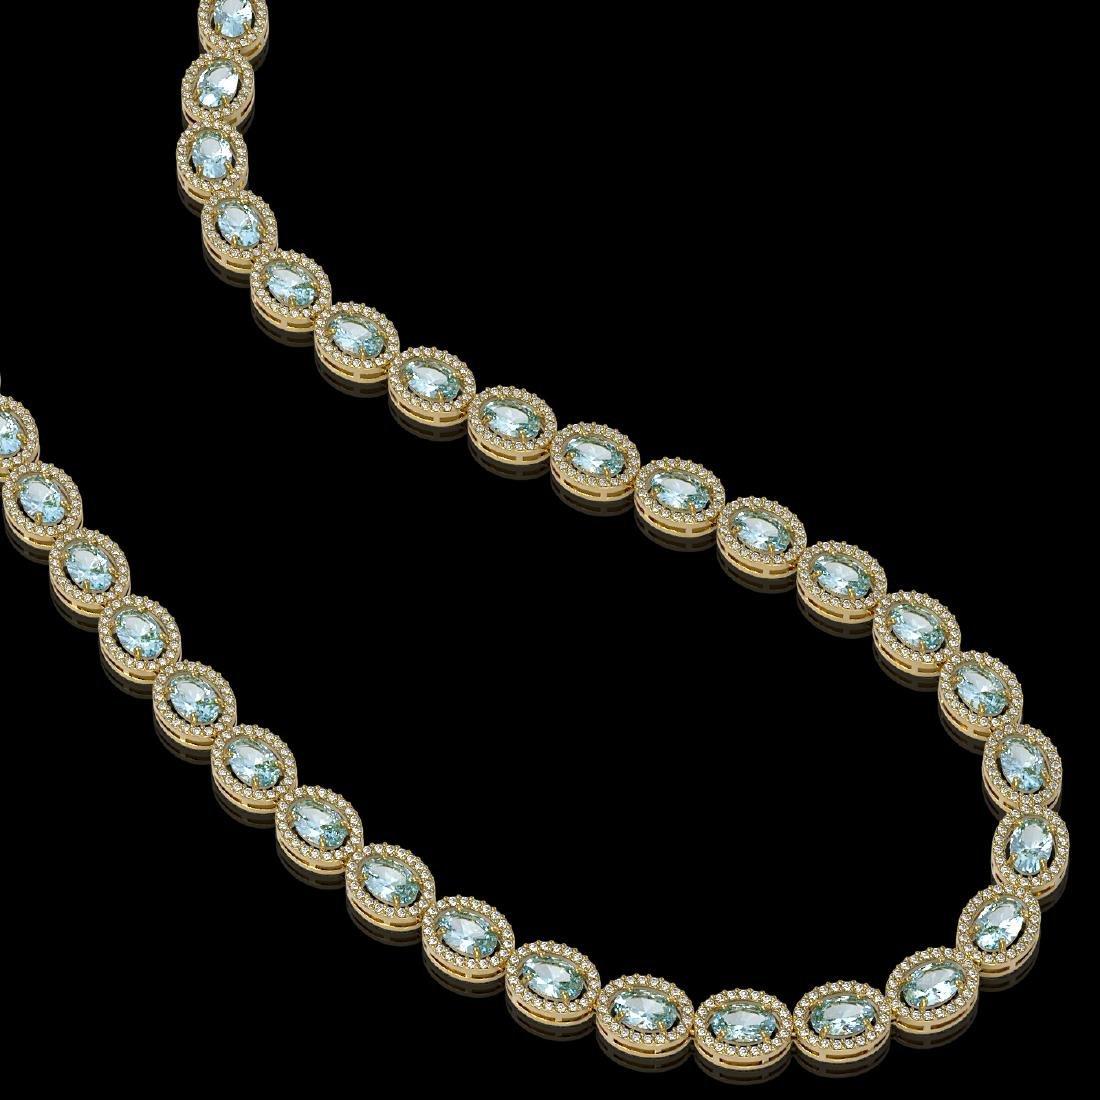 24.65 CTW Aquamarine & Diamond Halo Necklace 10K Yellow - 2